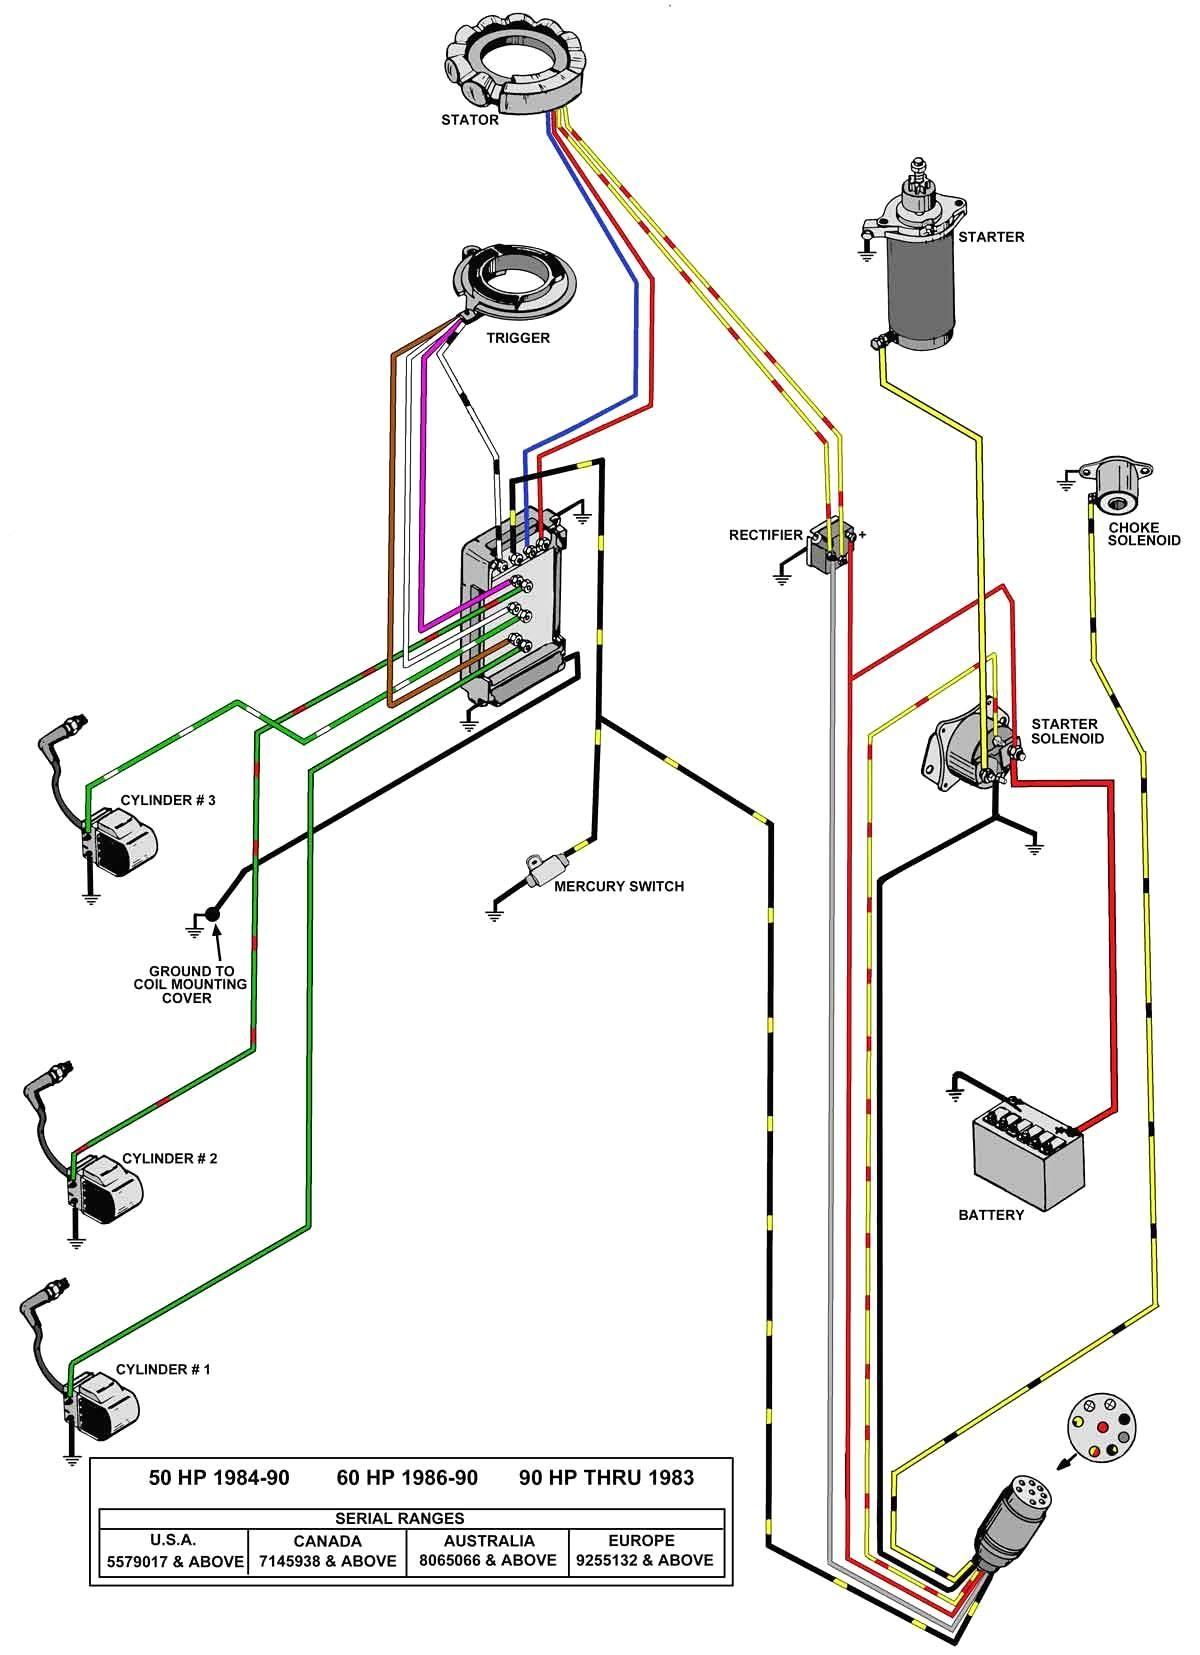 marine tachometer wiring diagram b2network co marine tach wiring diagram marine tachometer wiring diagram